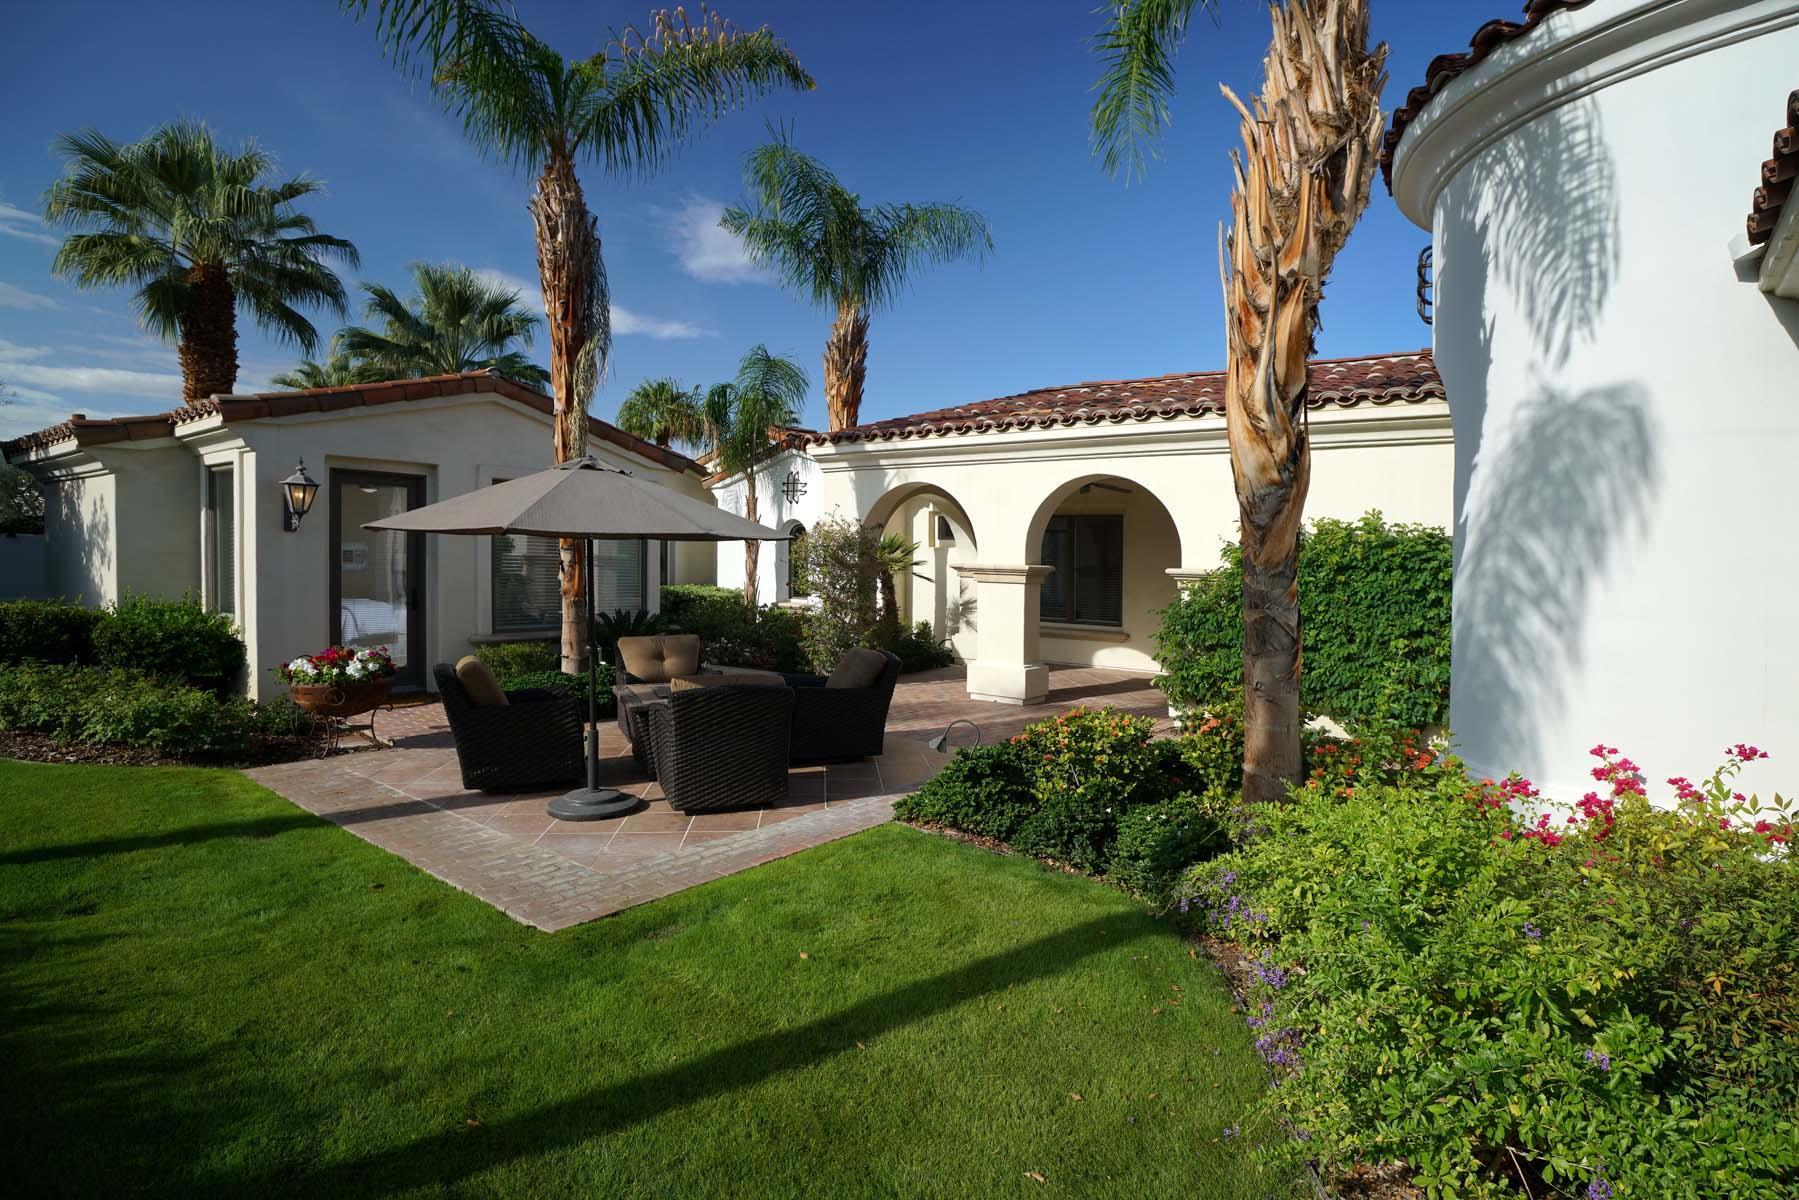 Photo of 76168 Via Chianti, Indian Wells, CA 92210